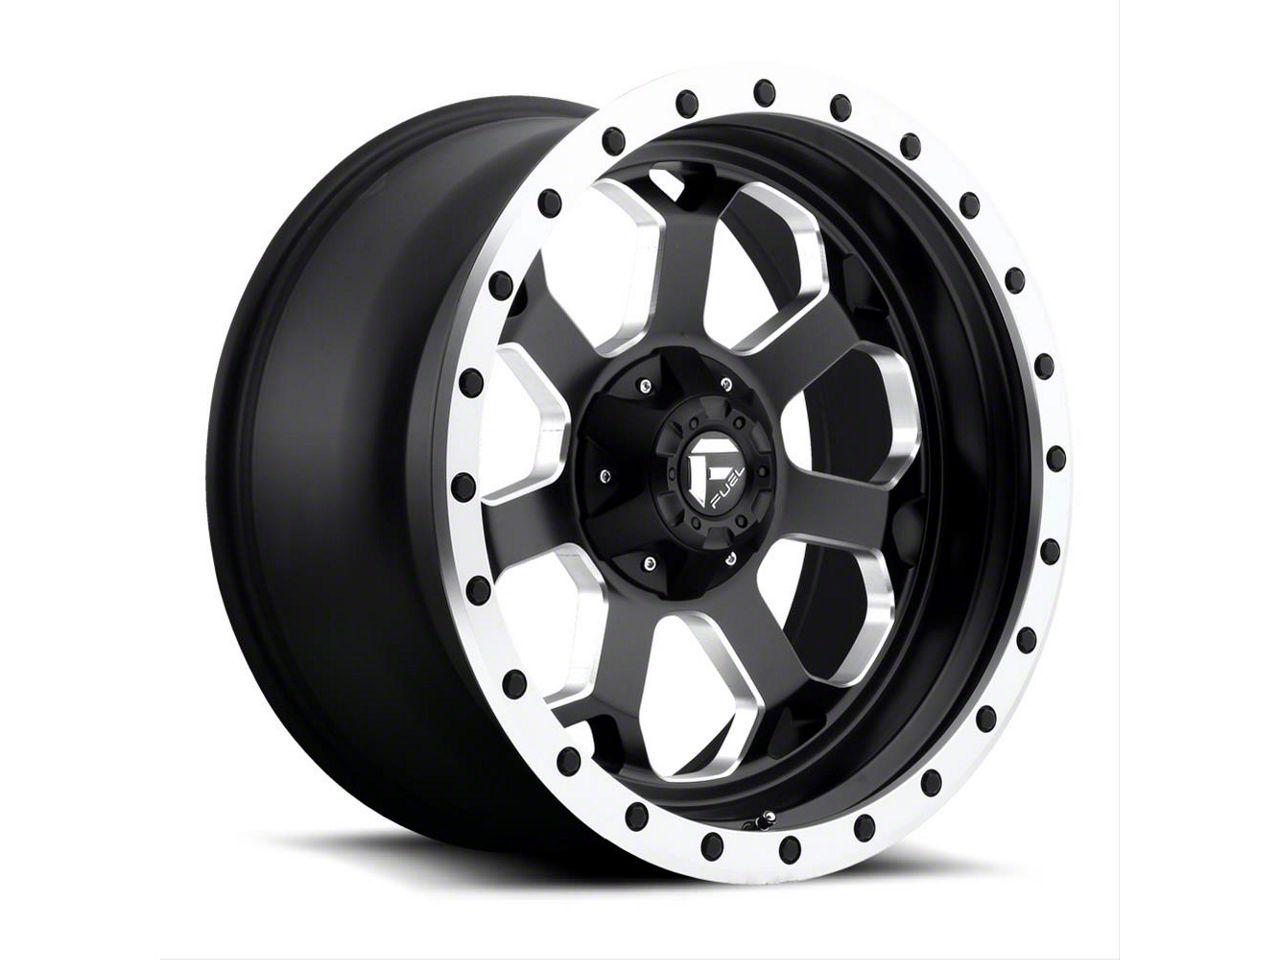 Fuel Wheels Savage Black Milled Wheel - 20x10 (87-06 Jeep Wrangler YJ & TJ)